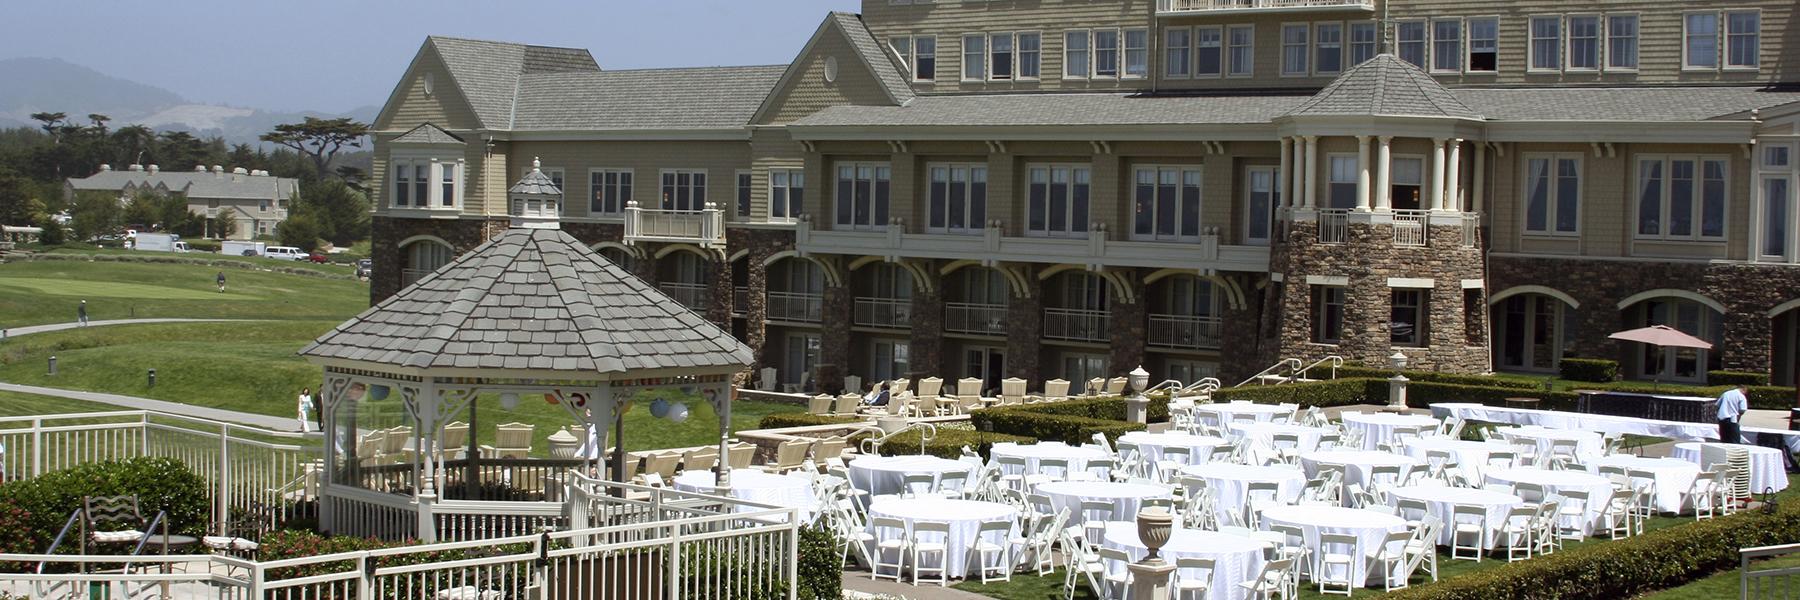 Wedding Spot Top Pennsylvania Wedding Venues For 2016